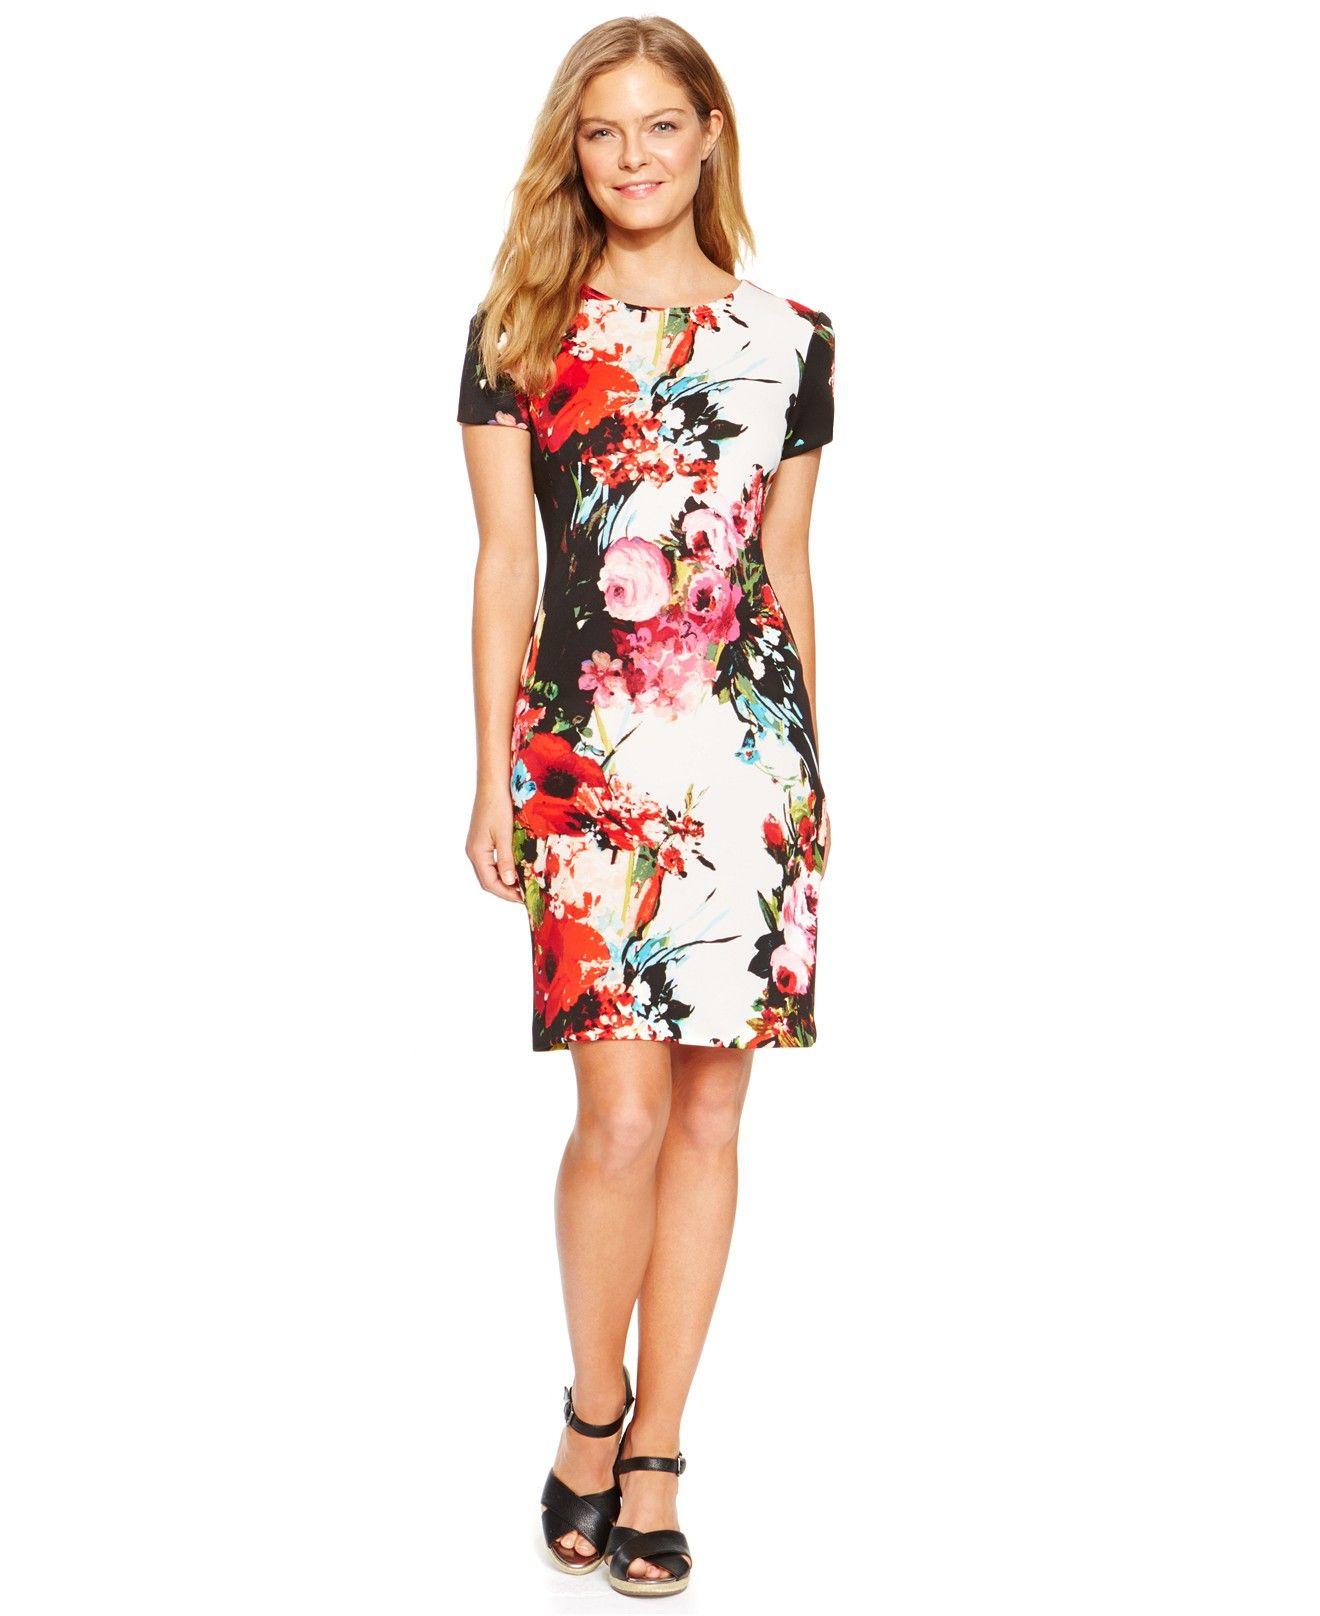 0dddae8b20 Sandra Darren Floral-Print Scuba Sheath Dress - Dresses - Women - Macy s